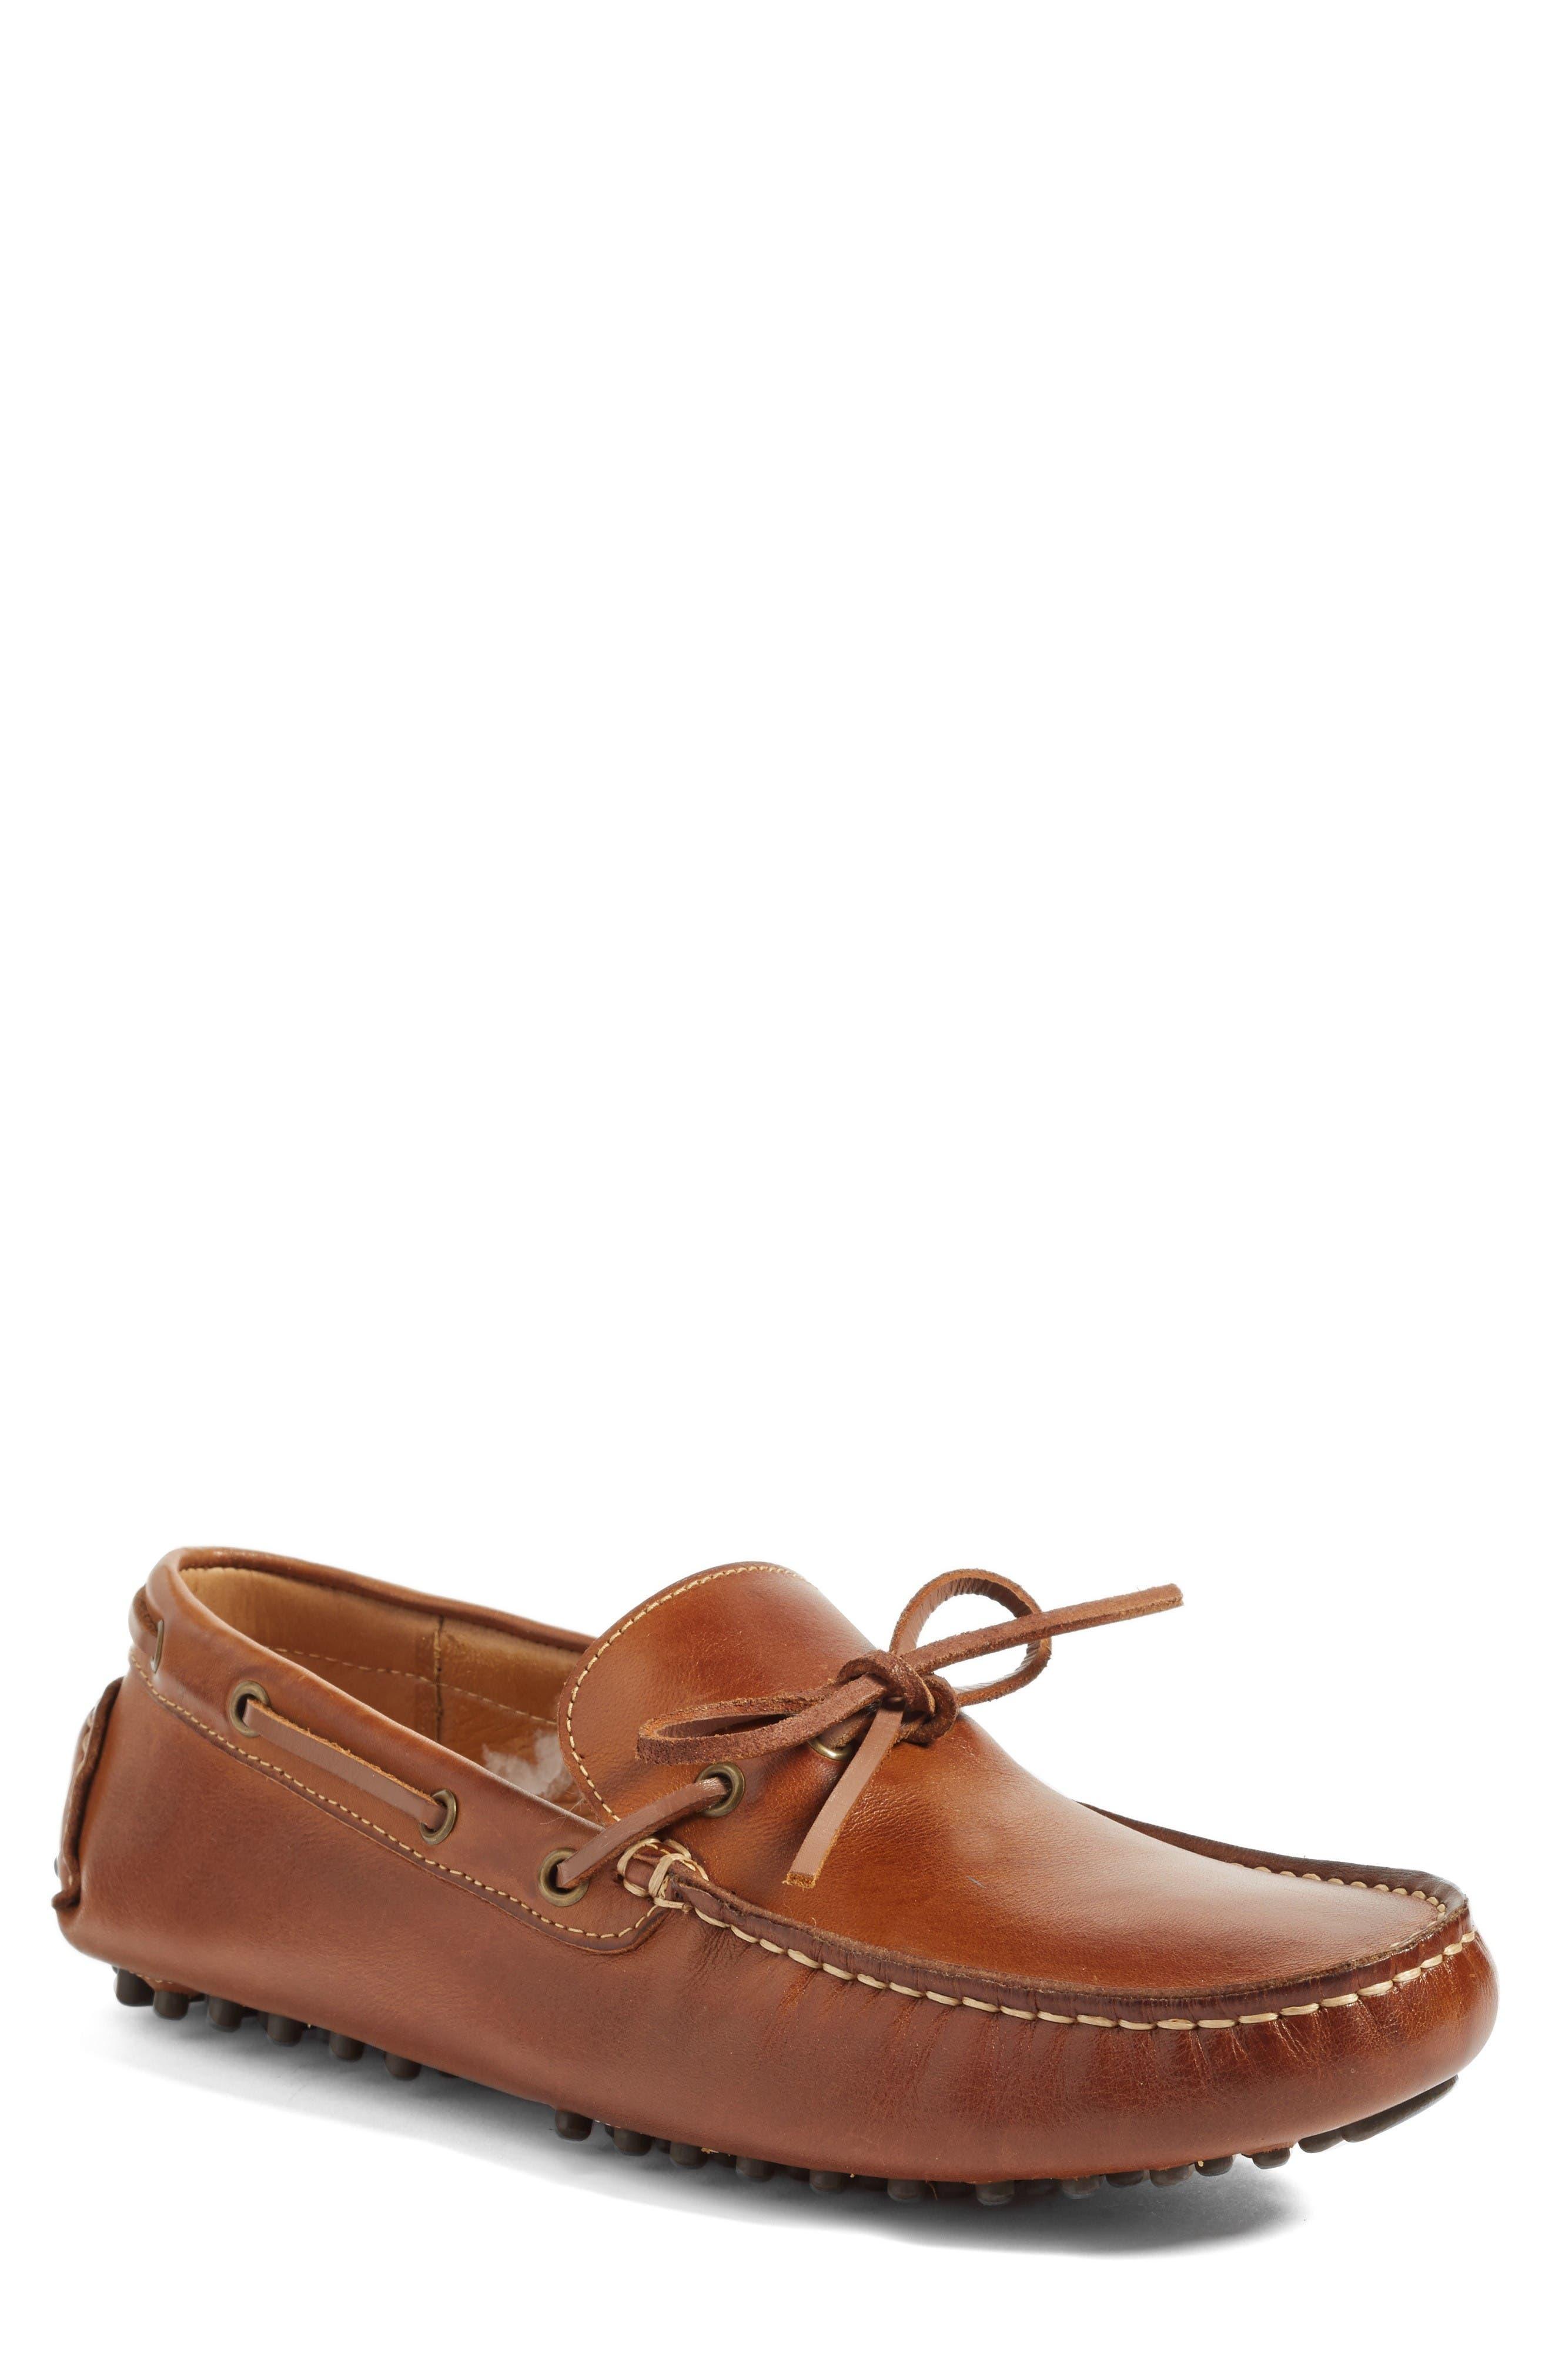 John W. Nordstrom® Midland Driving Shoe (Men)